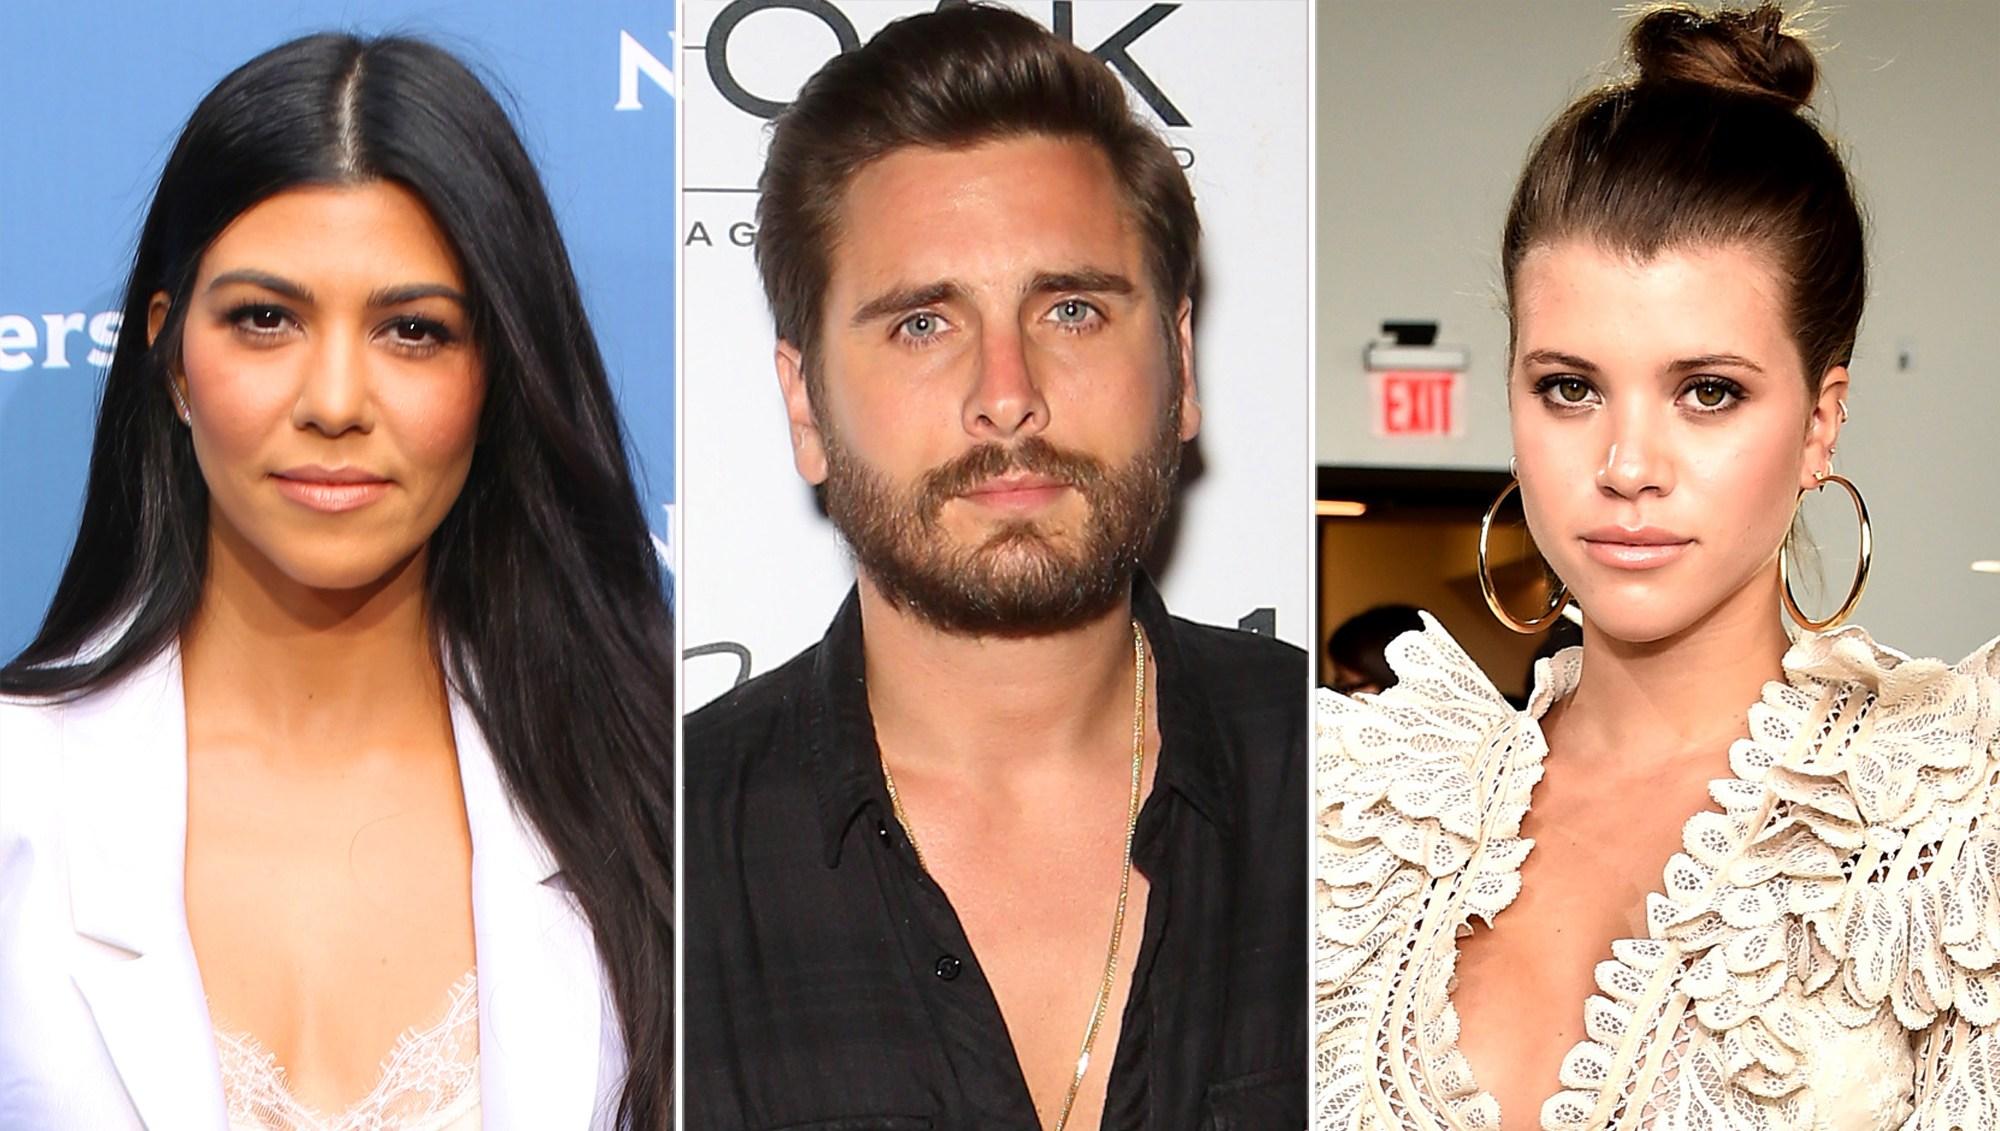 Kourtney Kardashian, Scott Disick, Sofia Richie